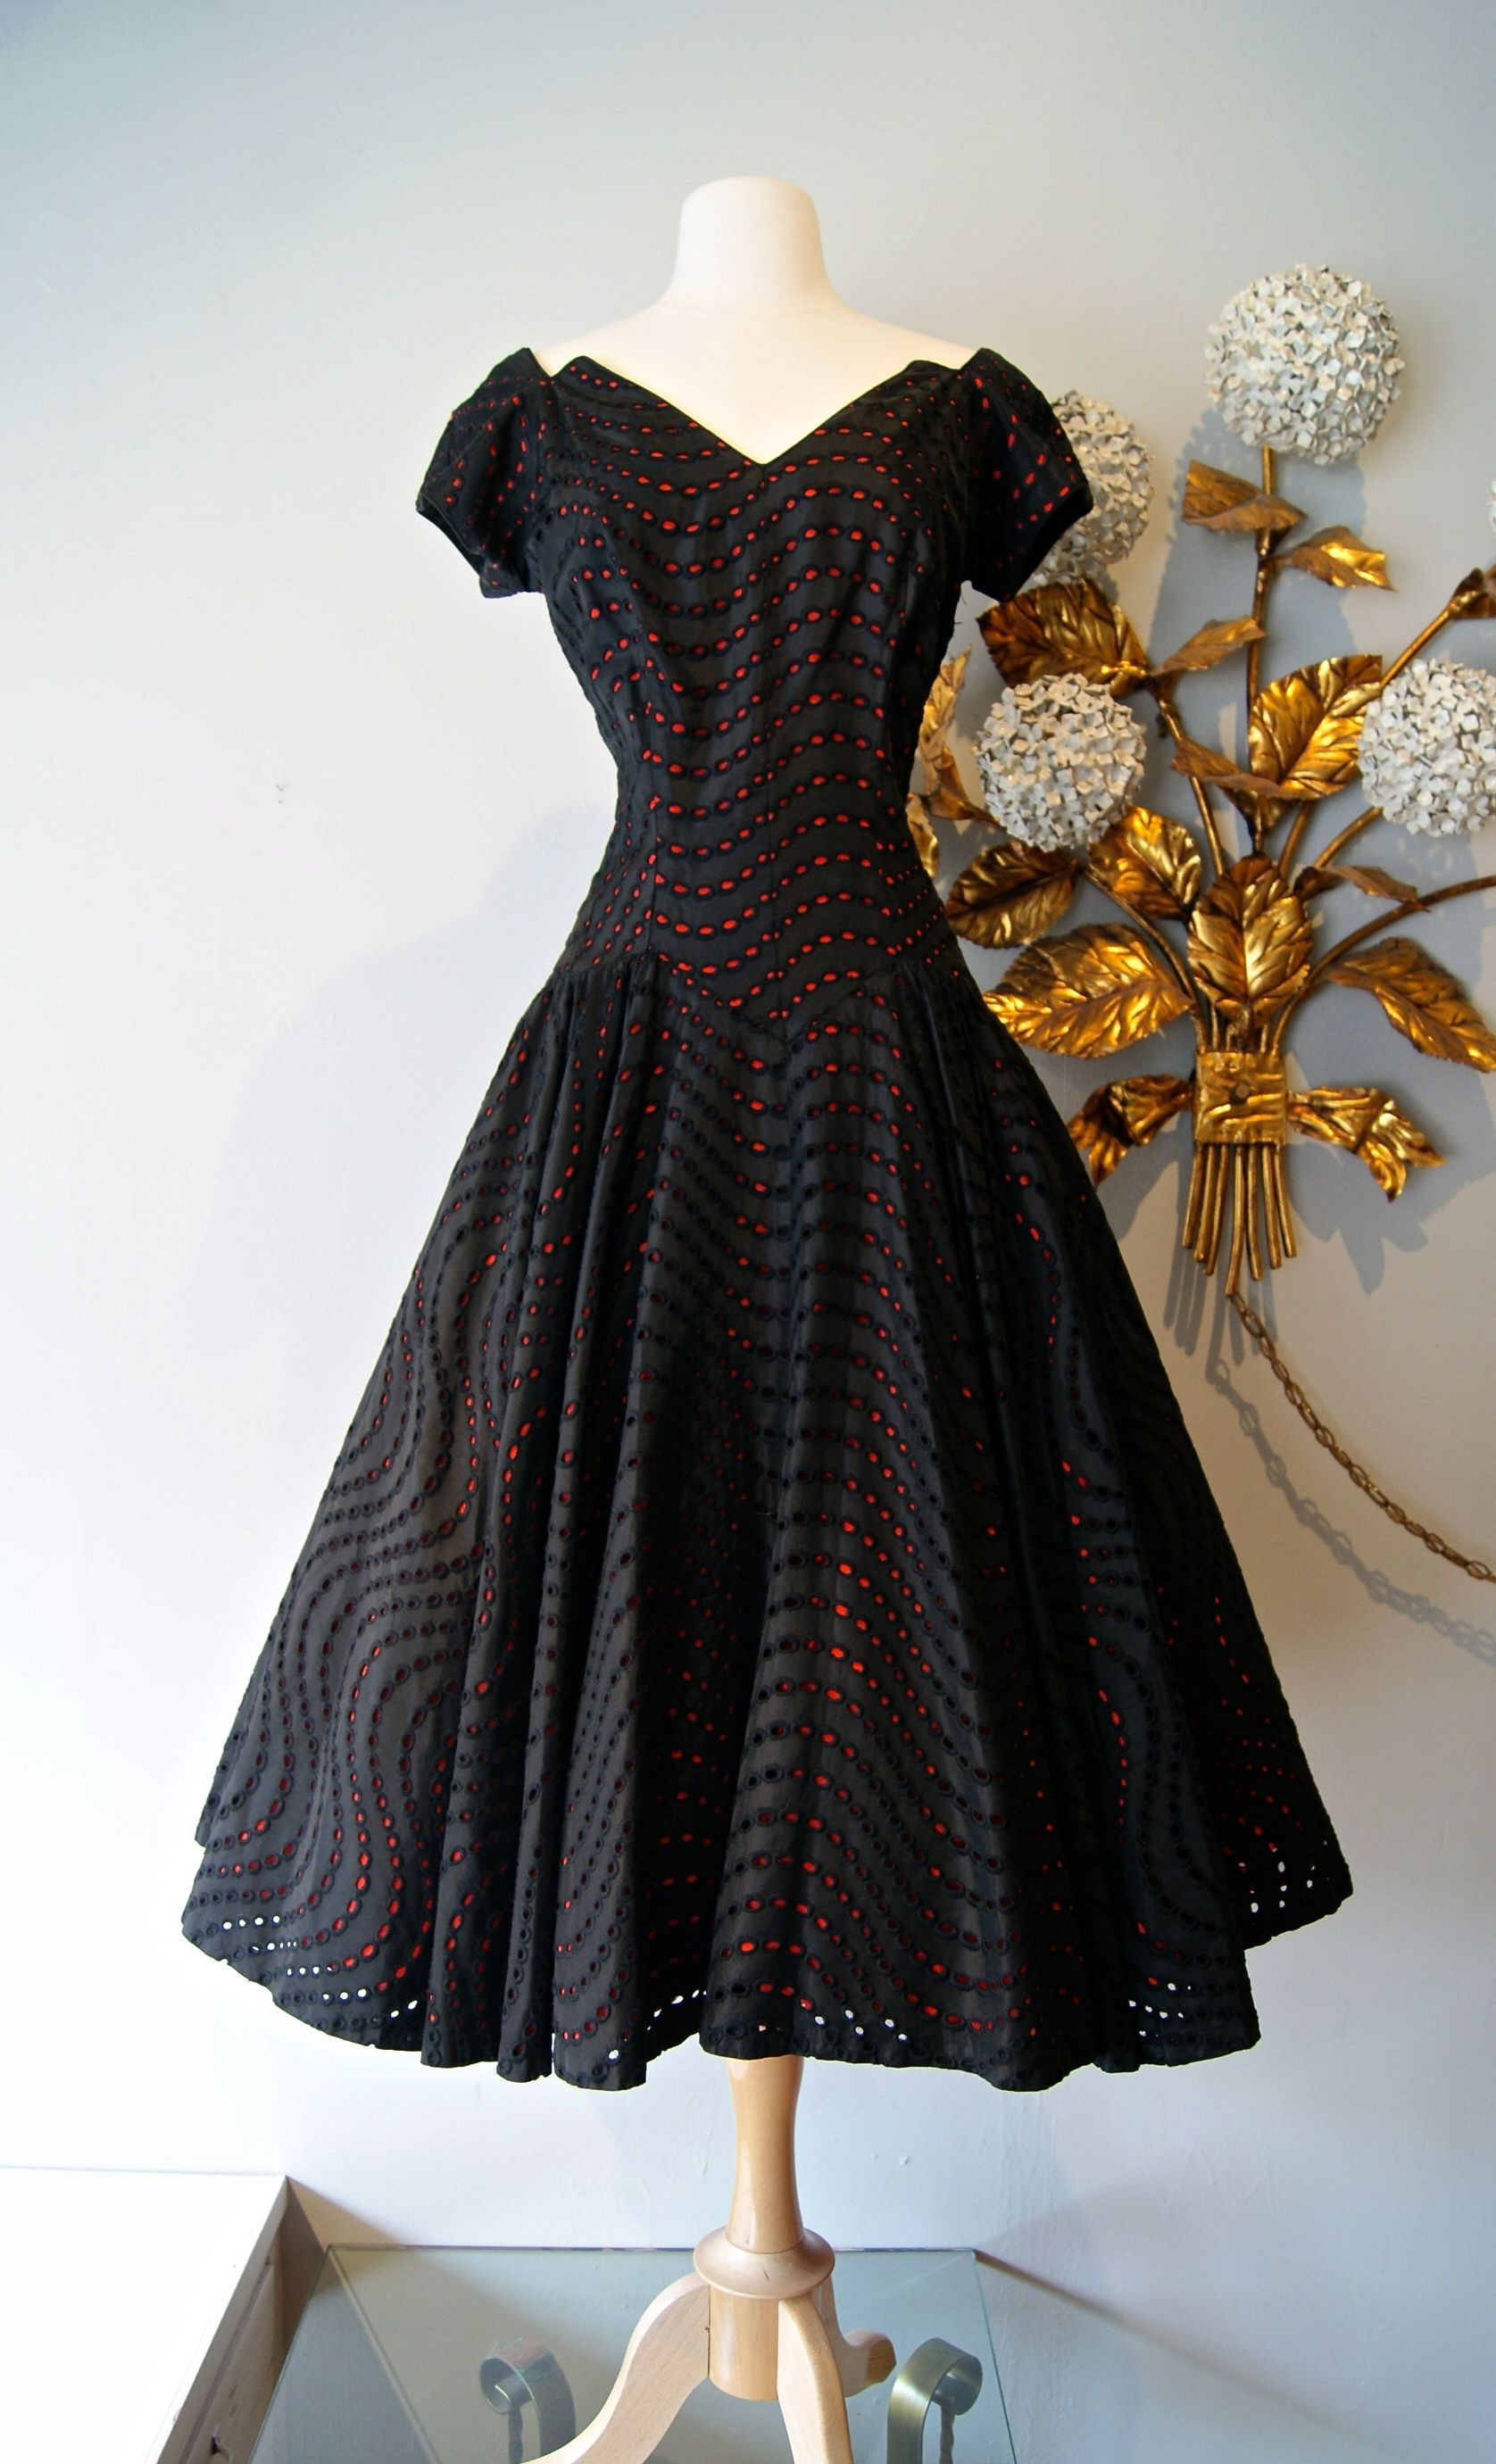 Vintage Dress 1950s New Look Cocktail Dress Vintage Dresses Cocktail Dress Vintage Vintage Style Dresses [ 2761 x 1676 Pixel ]